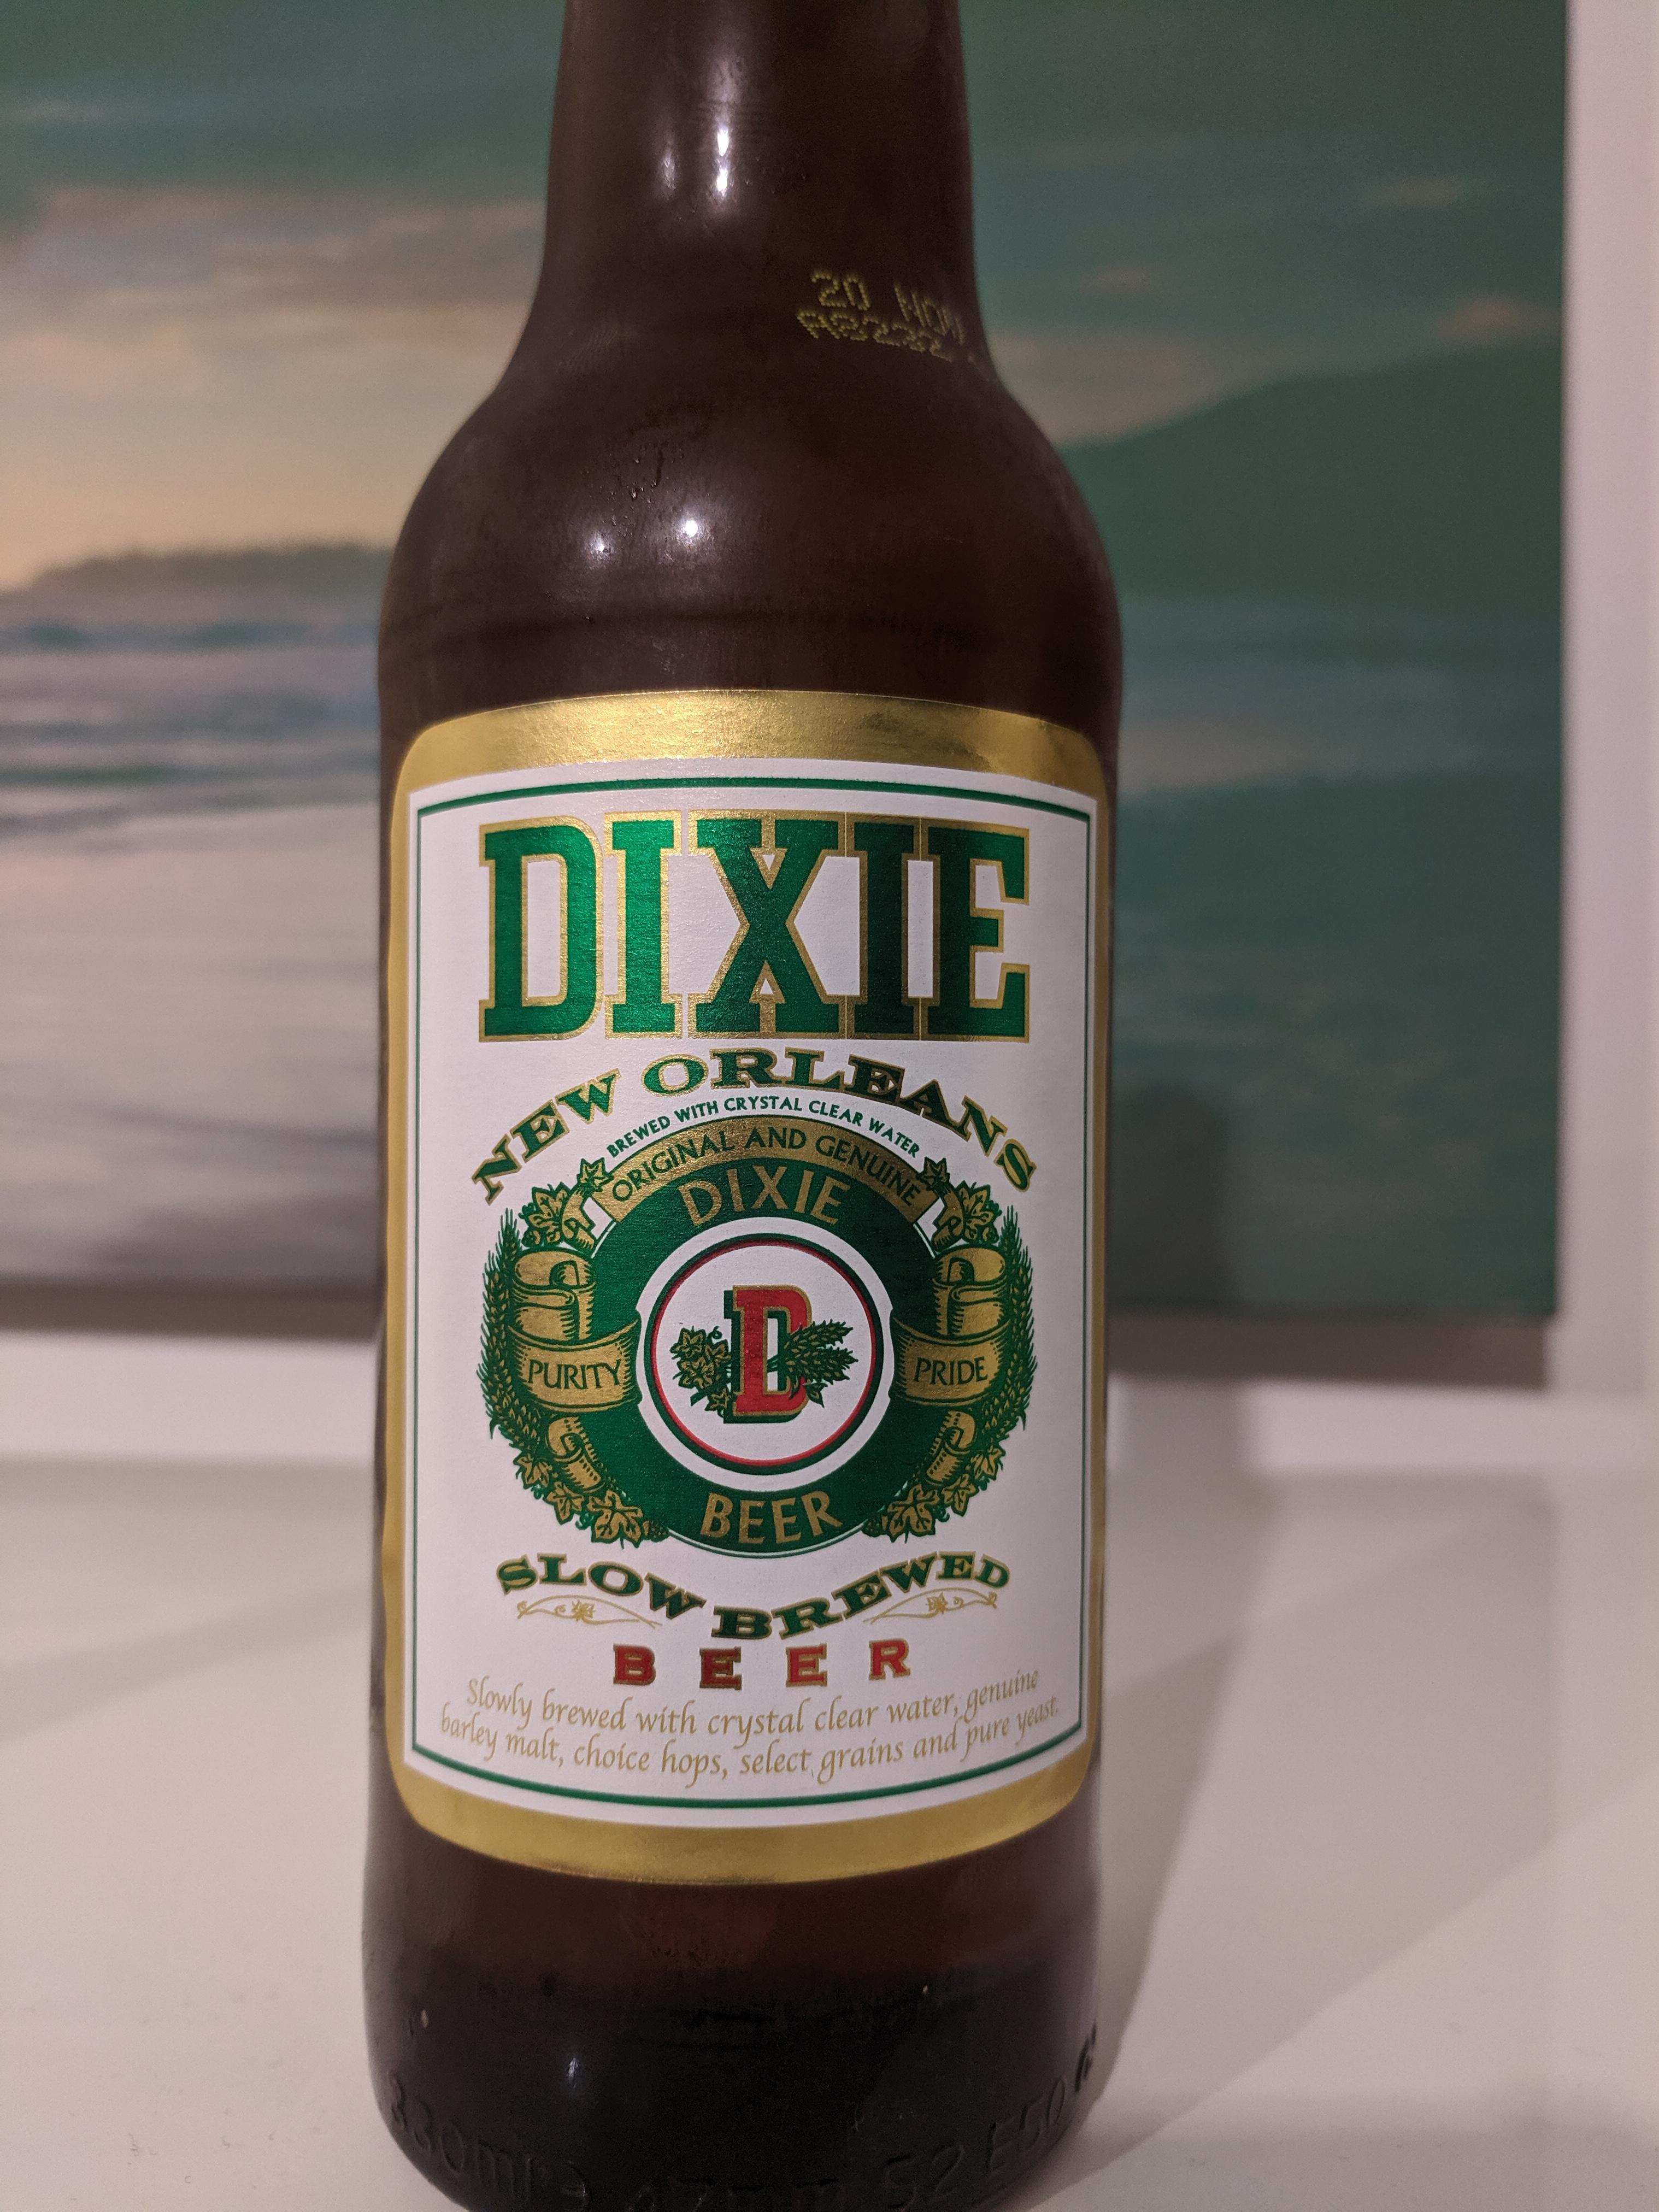 Dixie 'New Orleans' Beer £0.79 bottle (330ml - UK brewed) 79p @ Home Bargains